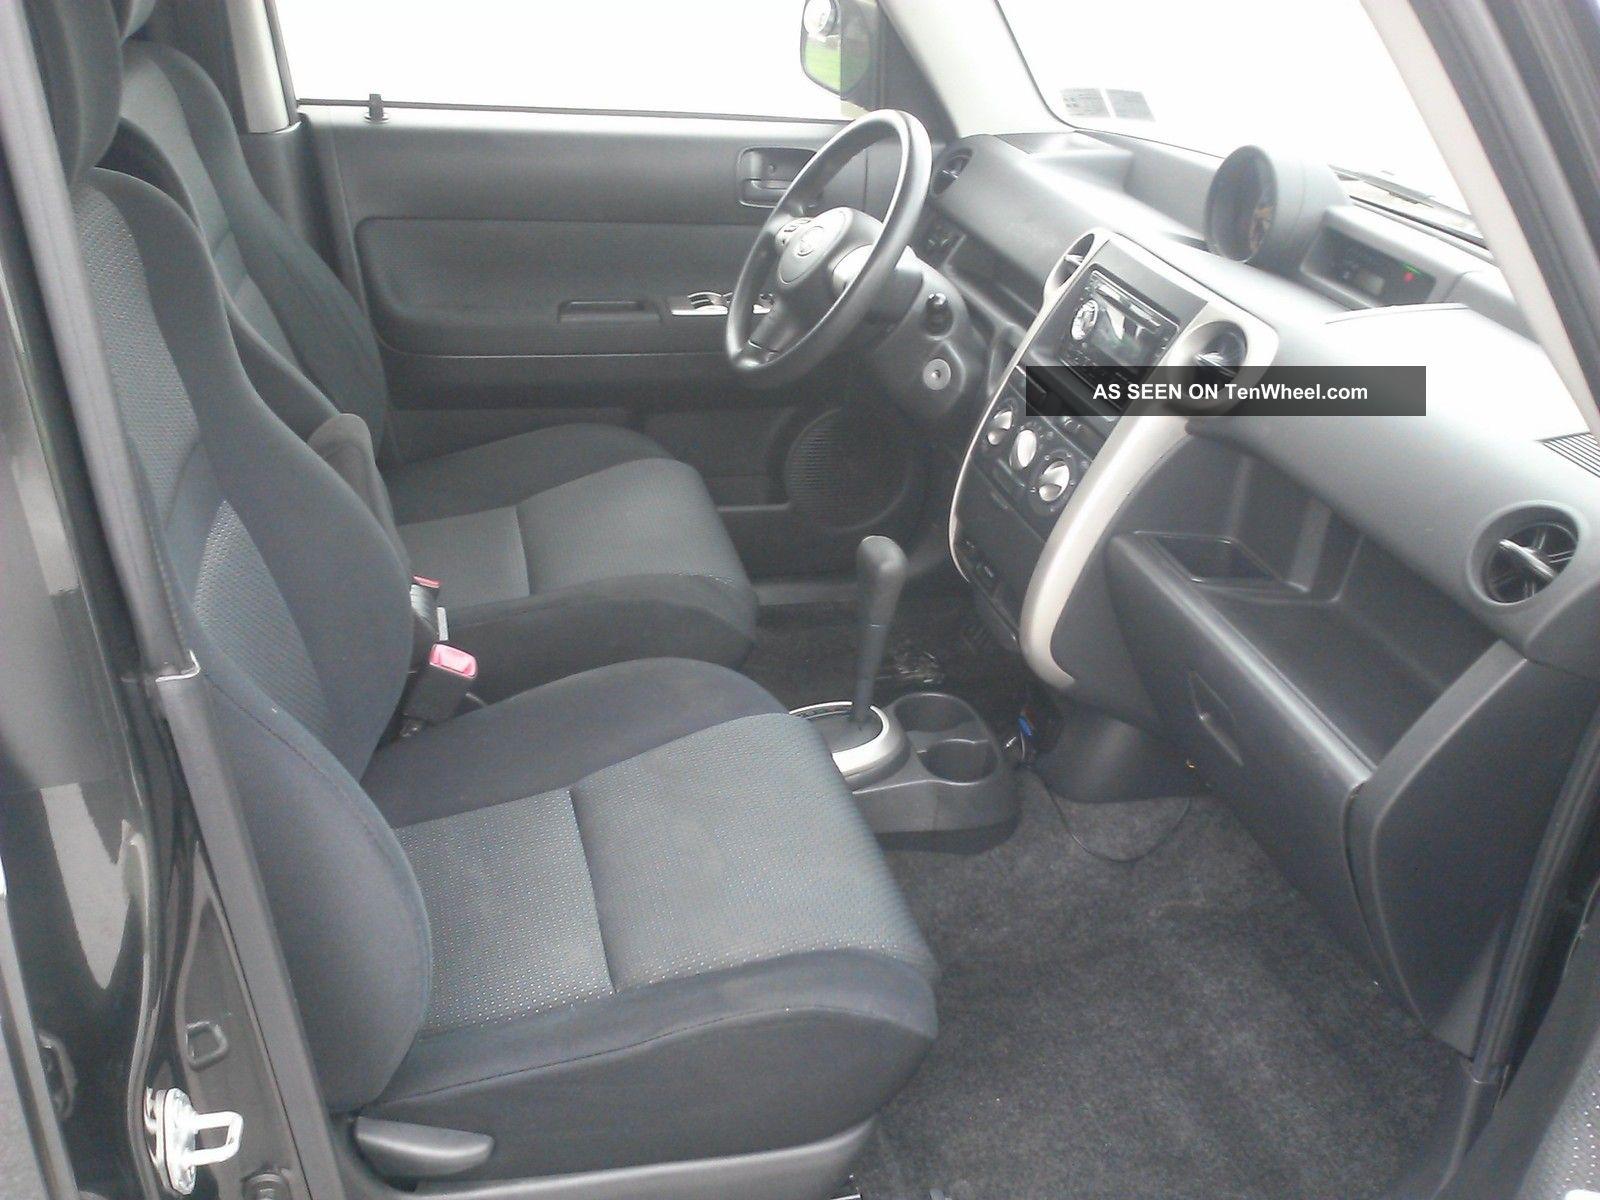 2006 Scion Xb Base Wagon 5 Door 1 5l Sharp Aftermarket